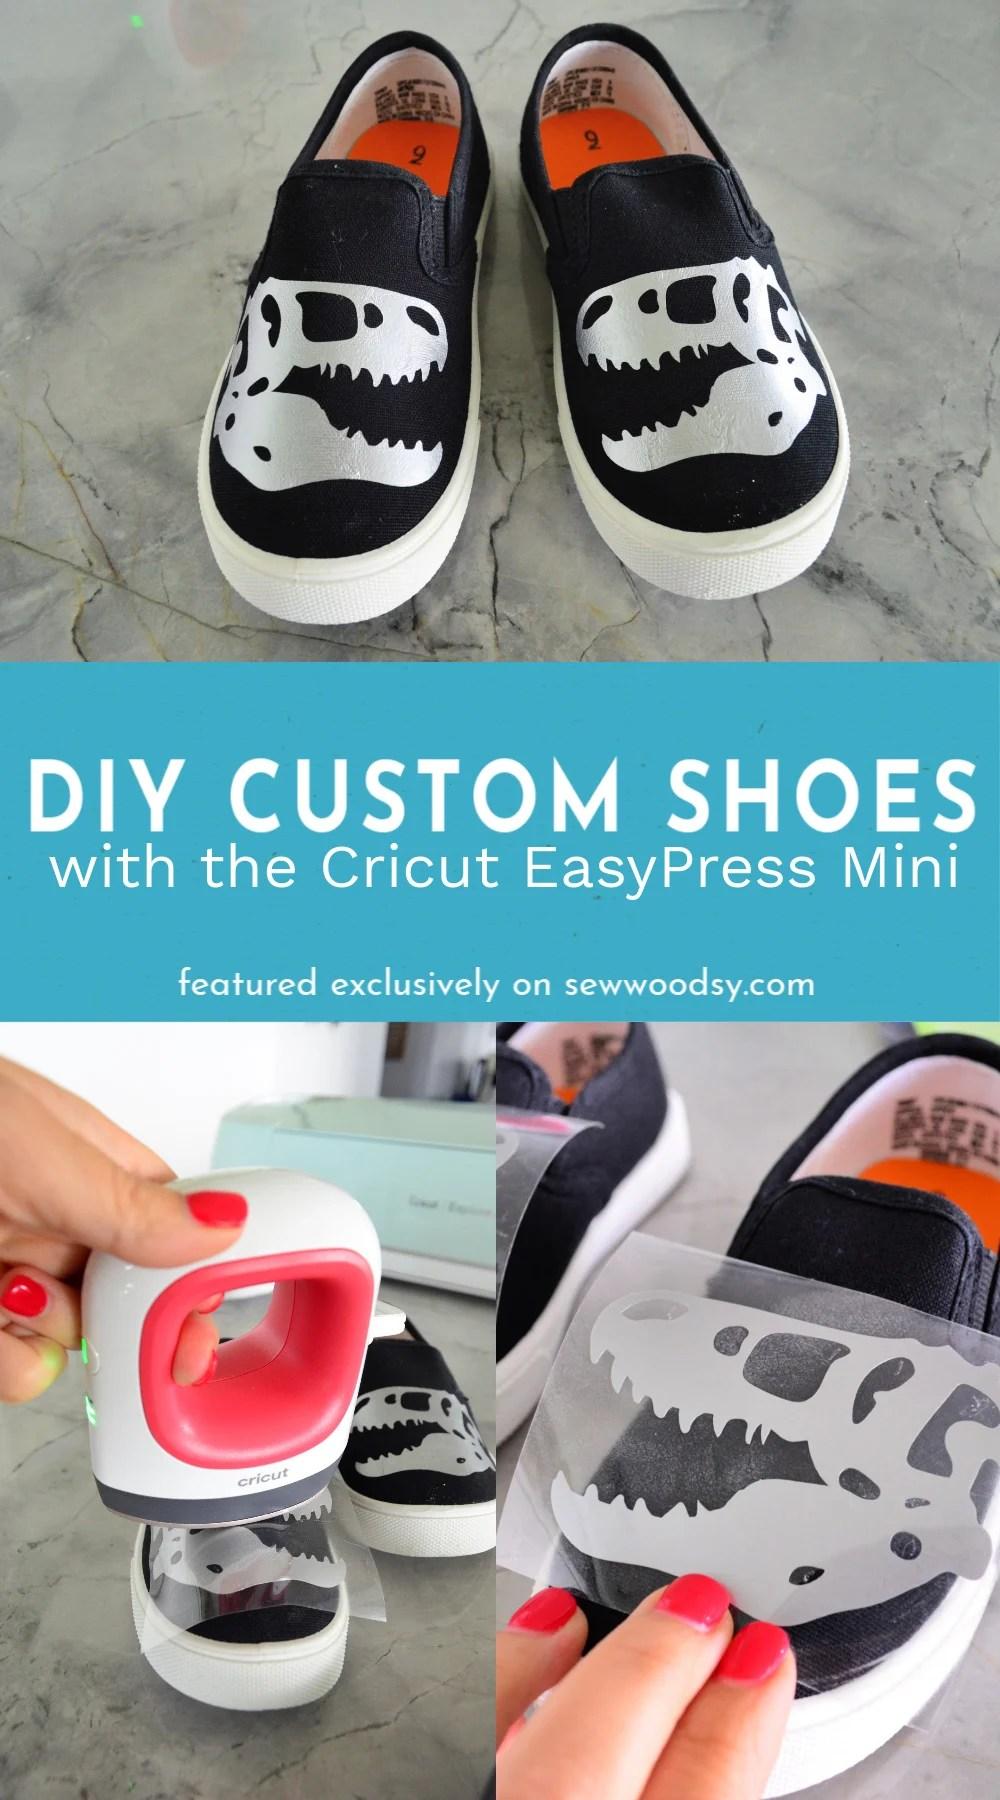 Three photos of how to use the Cricut EasyPress Mini to make custom shoes.